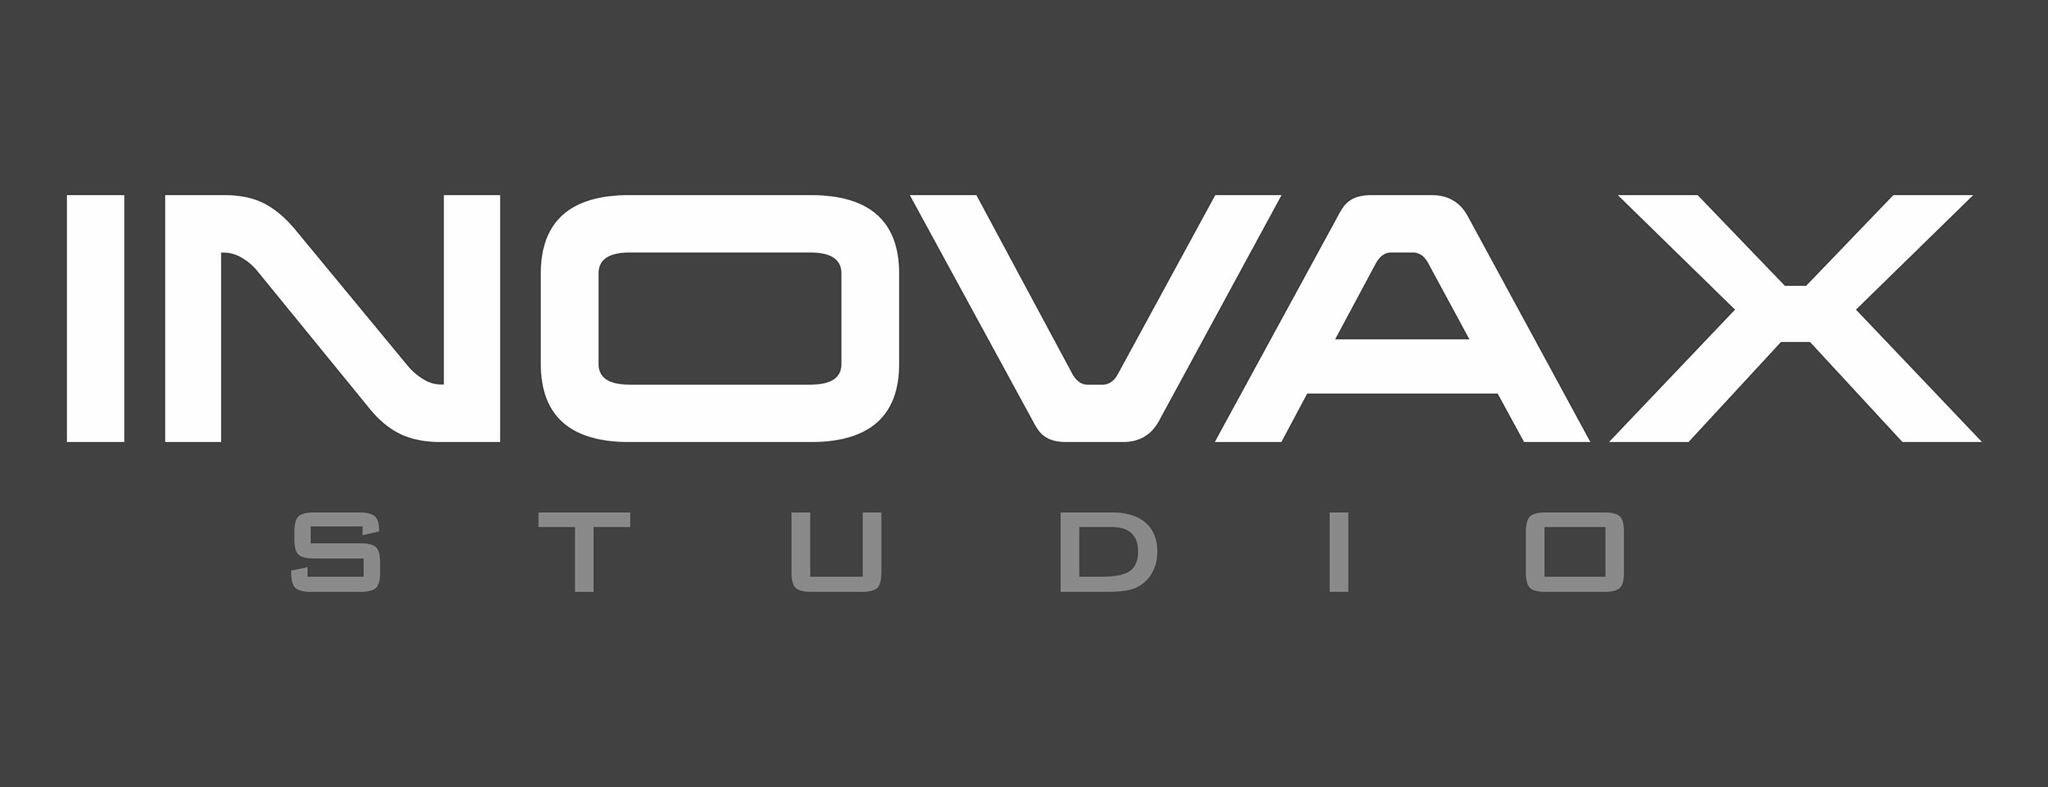 Inovax